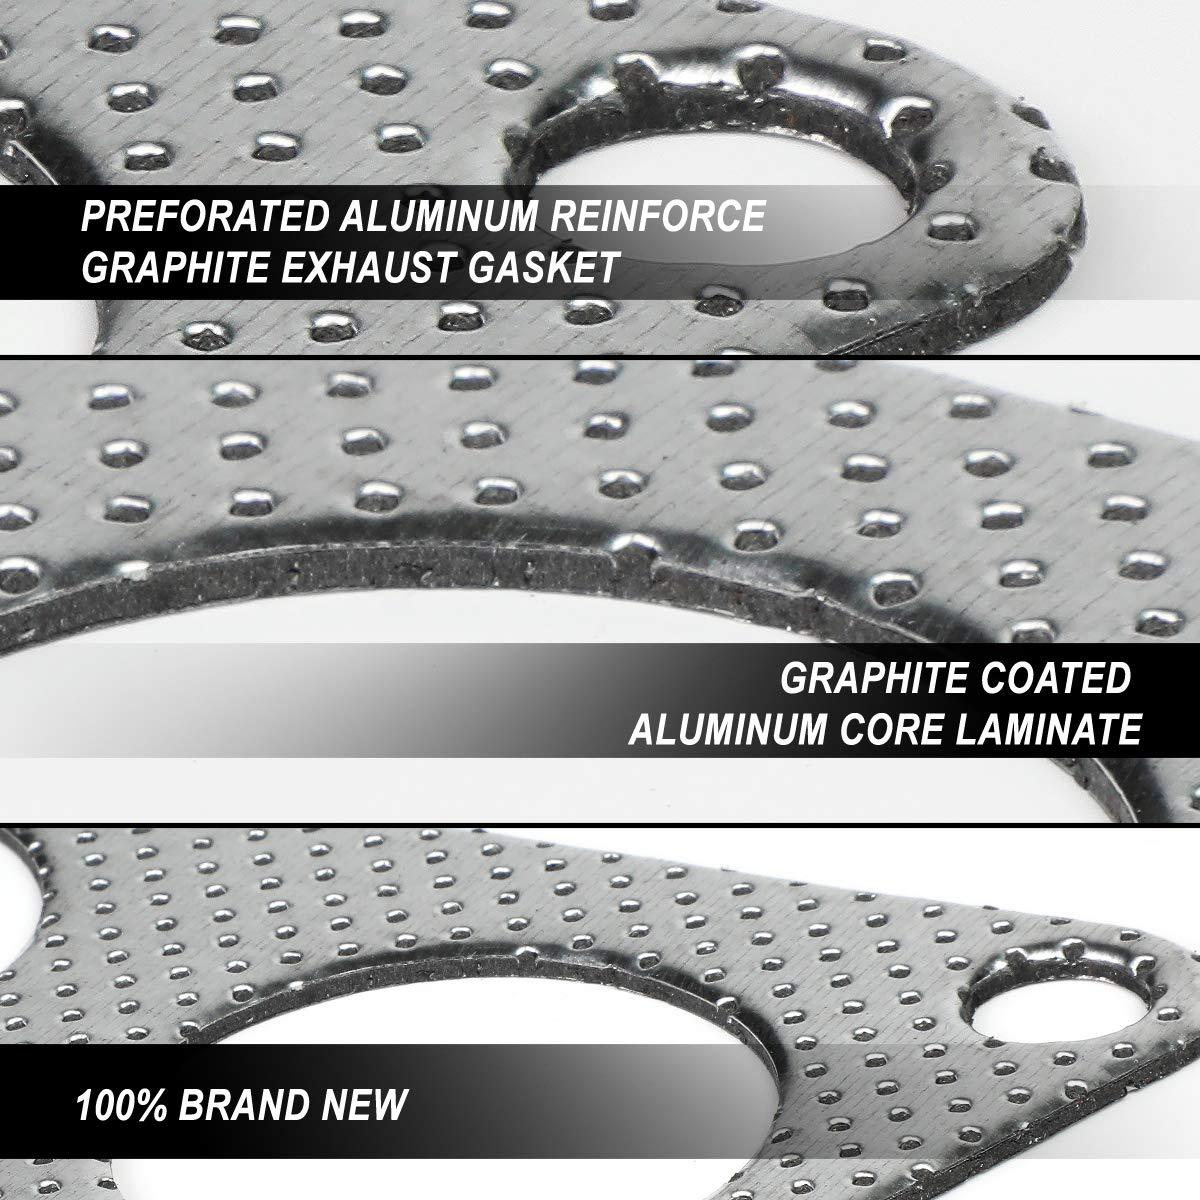 Aluminum Exhaust Manifold Header Gasket Set for 03-08 Hyundai Tiburon 2.7L V6